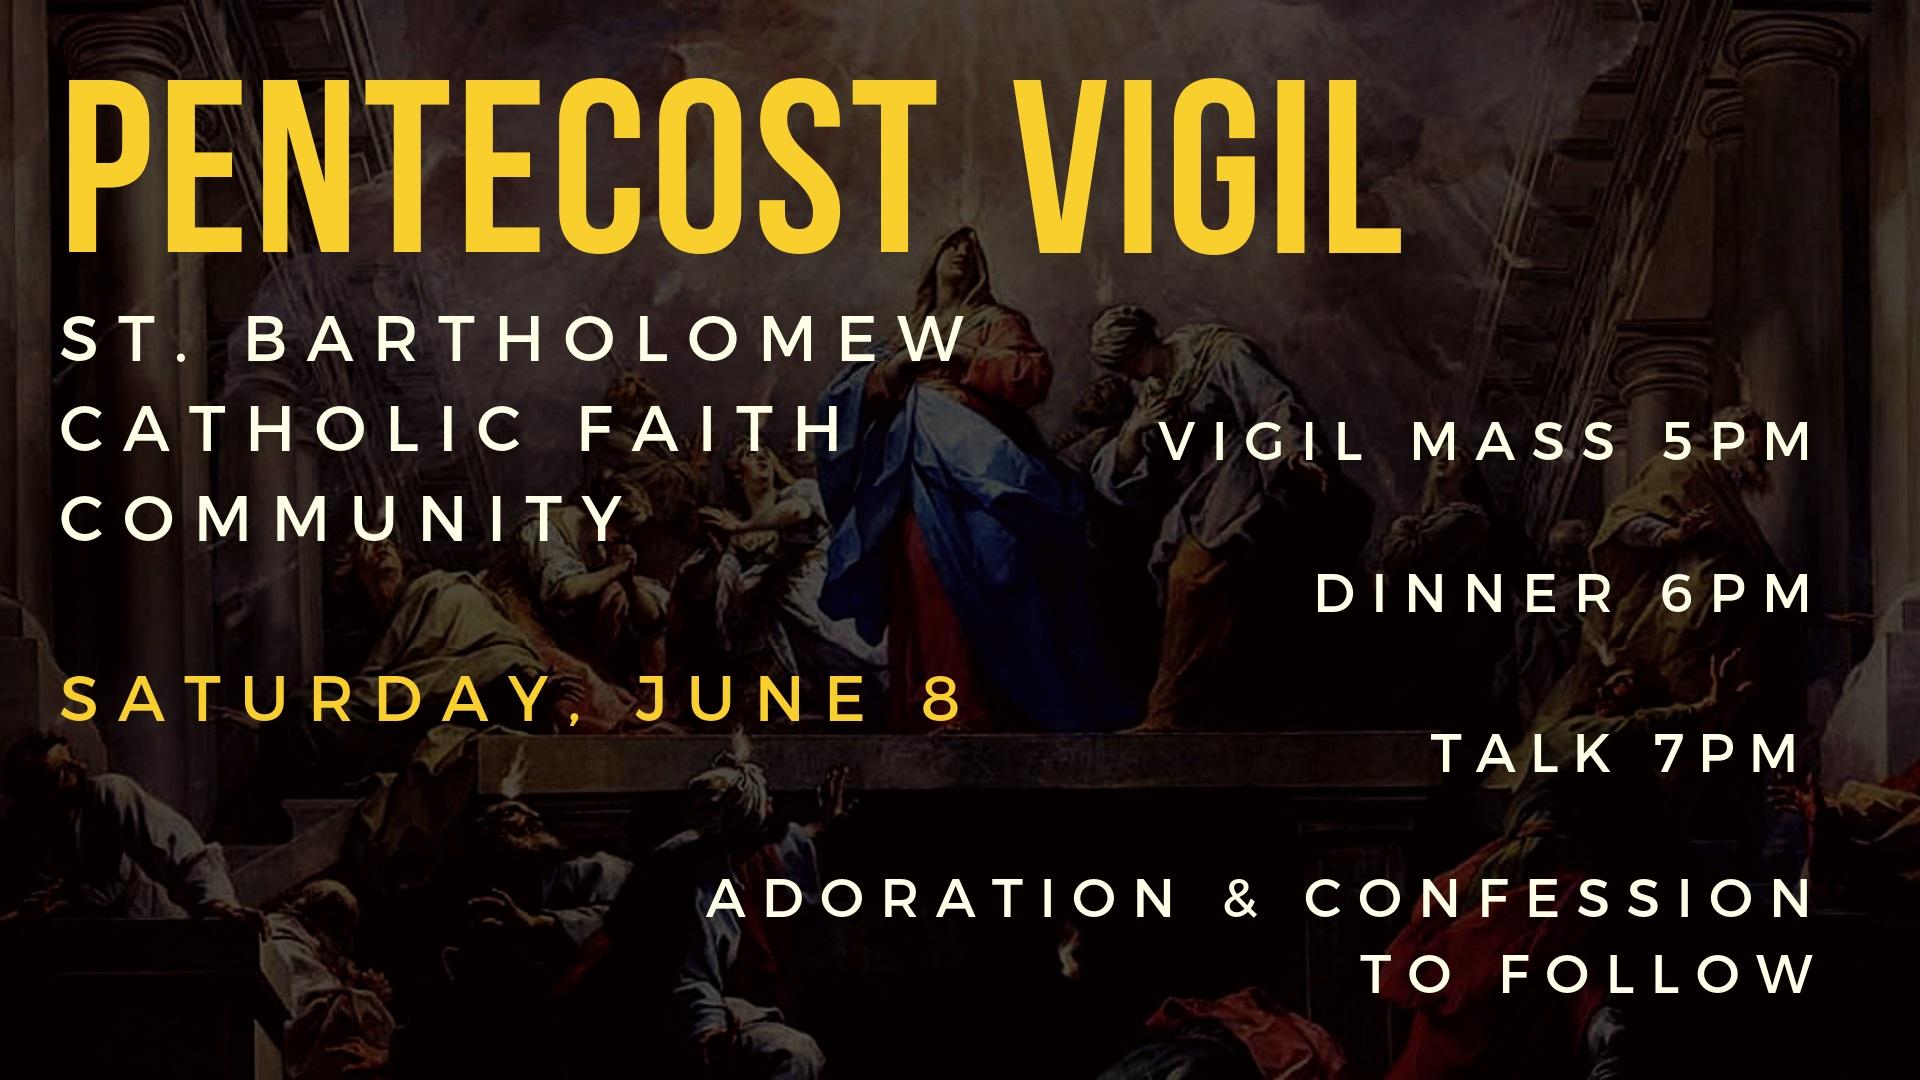 Pentecost Vigil.jpg